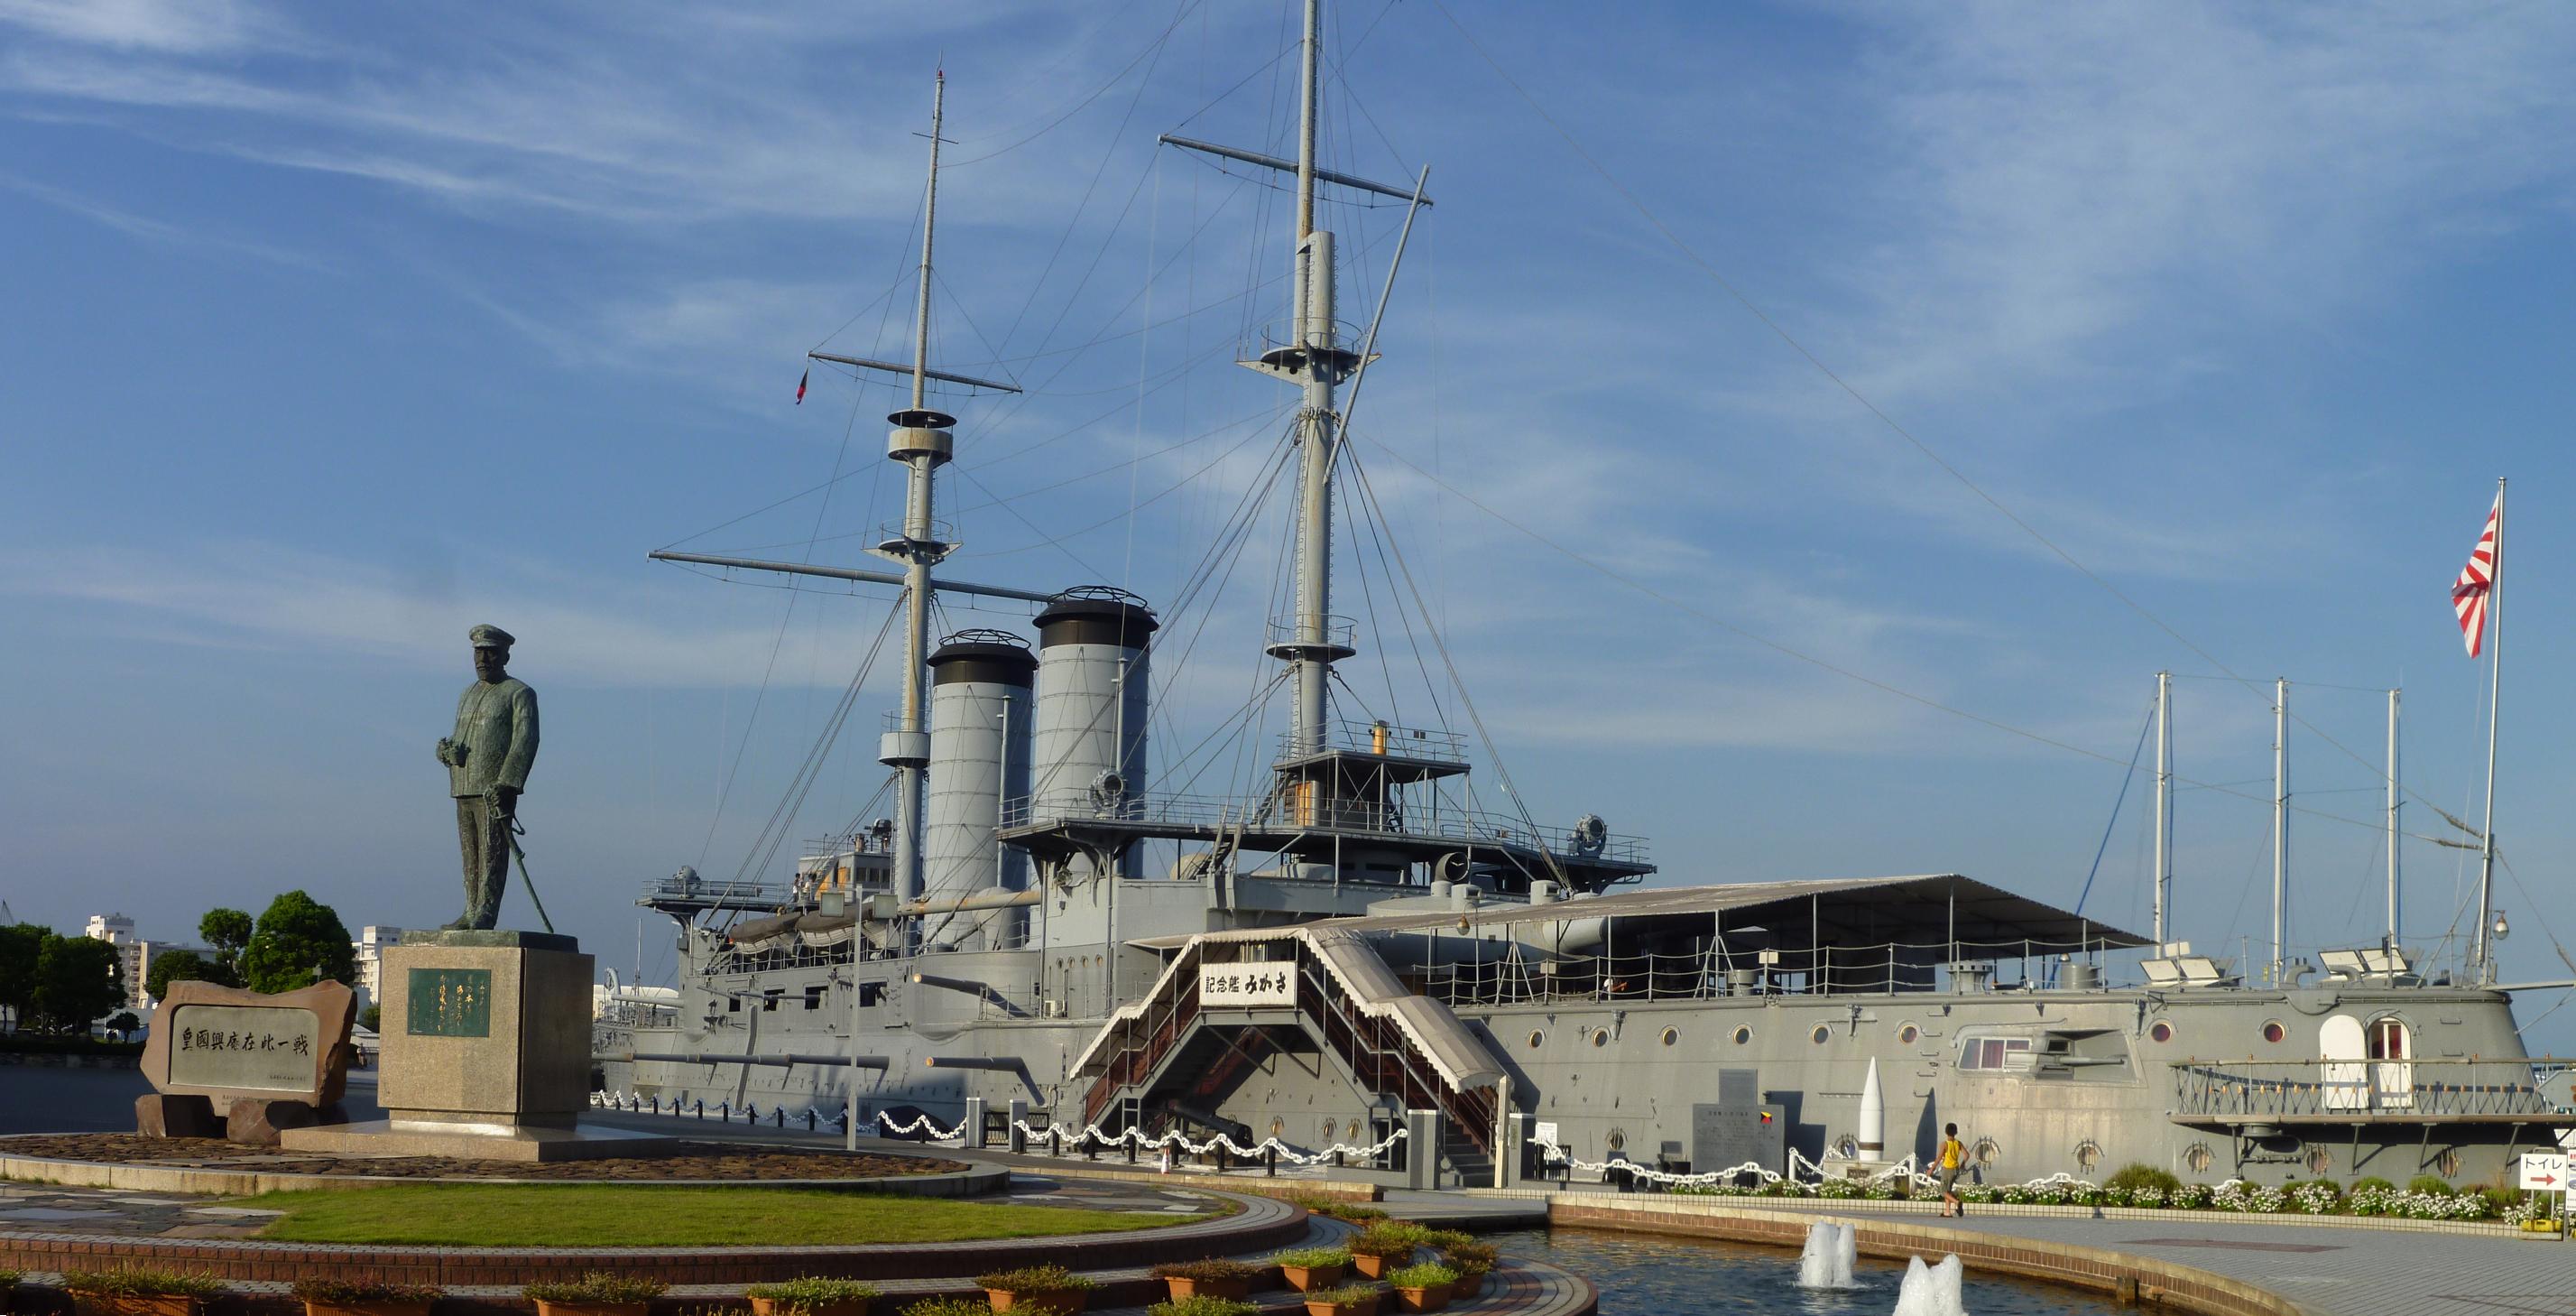 The battleship Mikasa, Admiral Tōgō's flagship at the battle of Tsushima, preserved as a memorial in Yokosuka, Japan. Photo taken on August 30, 2010.